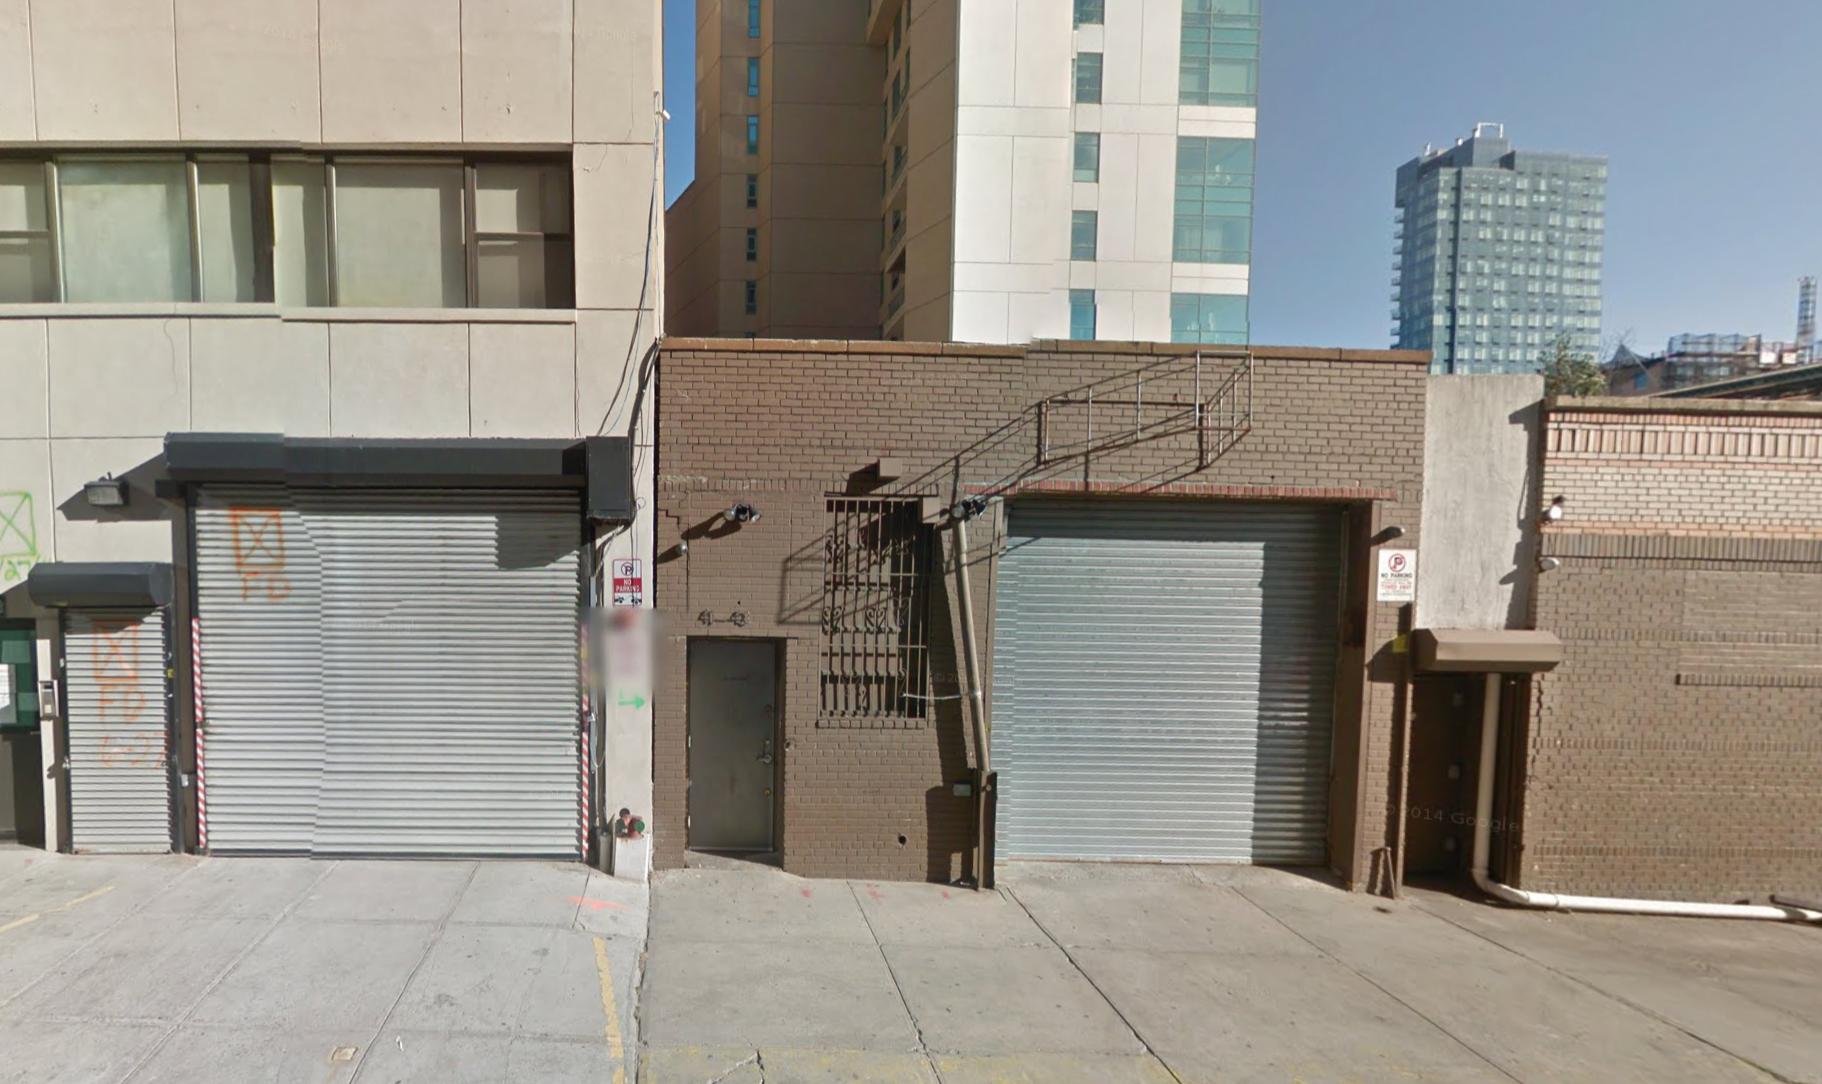 41-41 24th Street, image via Google Maps